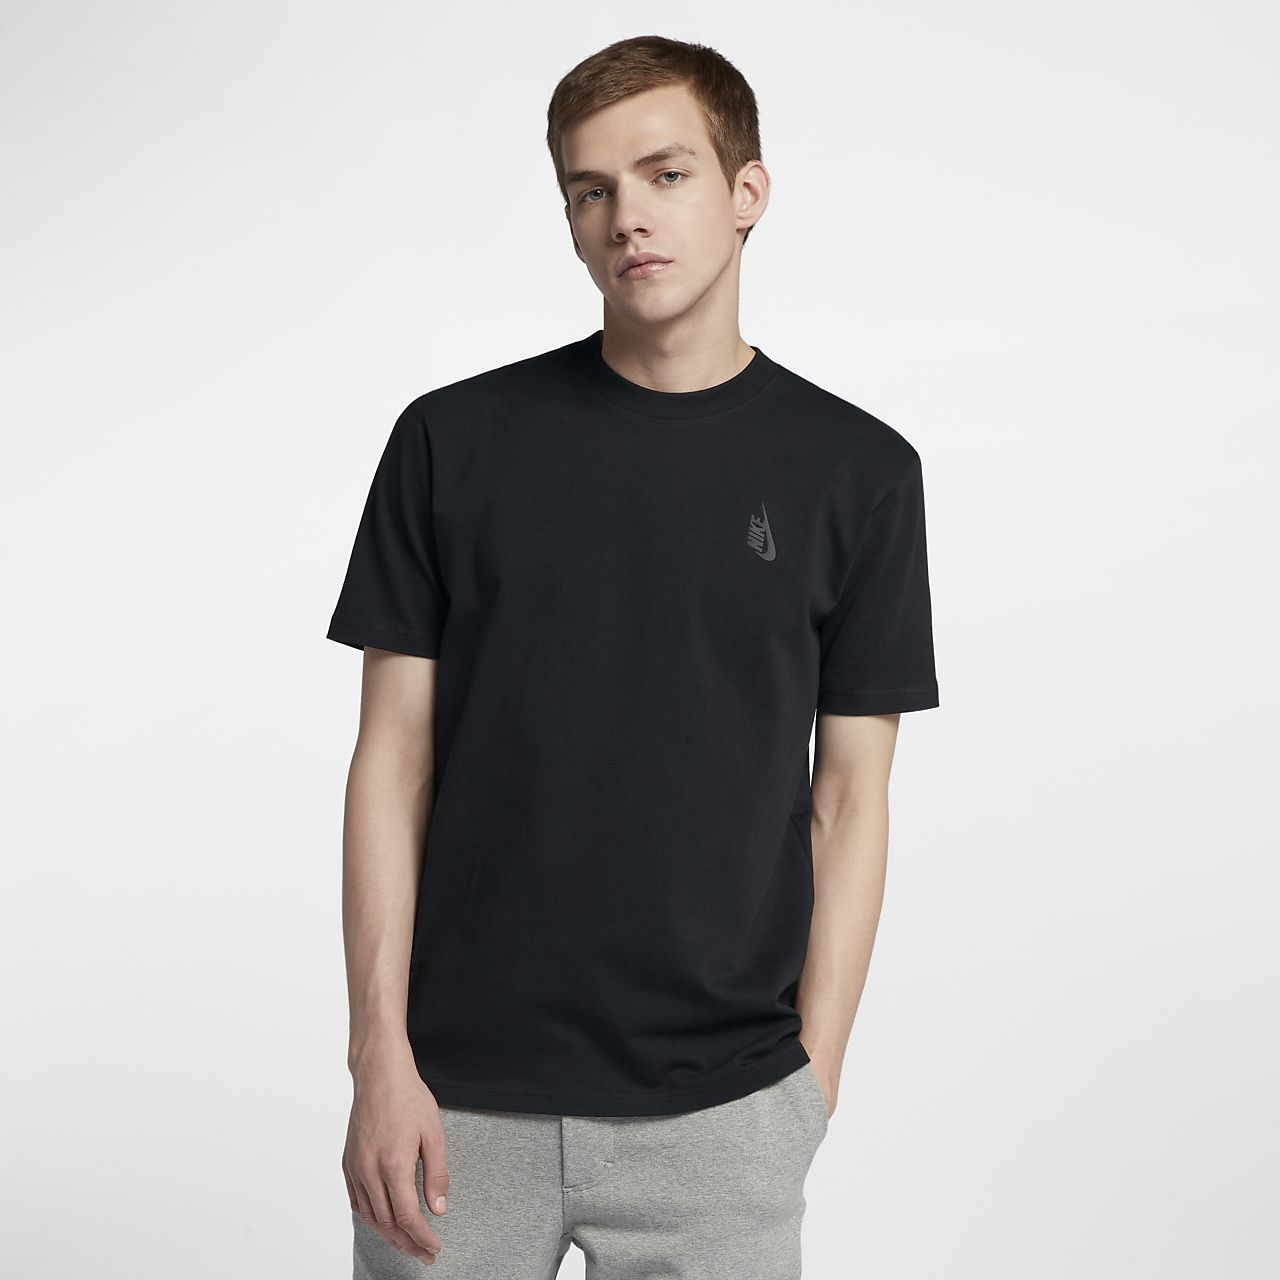 NikeLab Collection 男子T恤